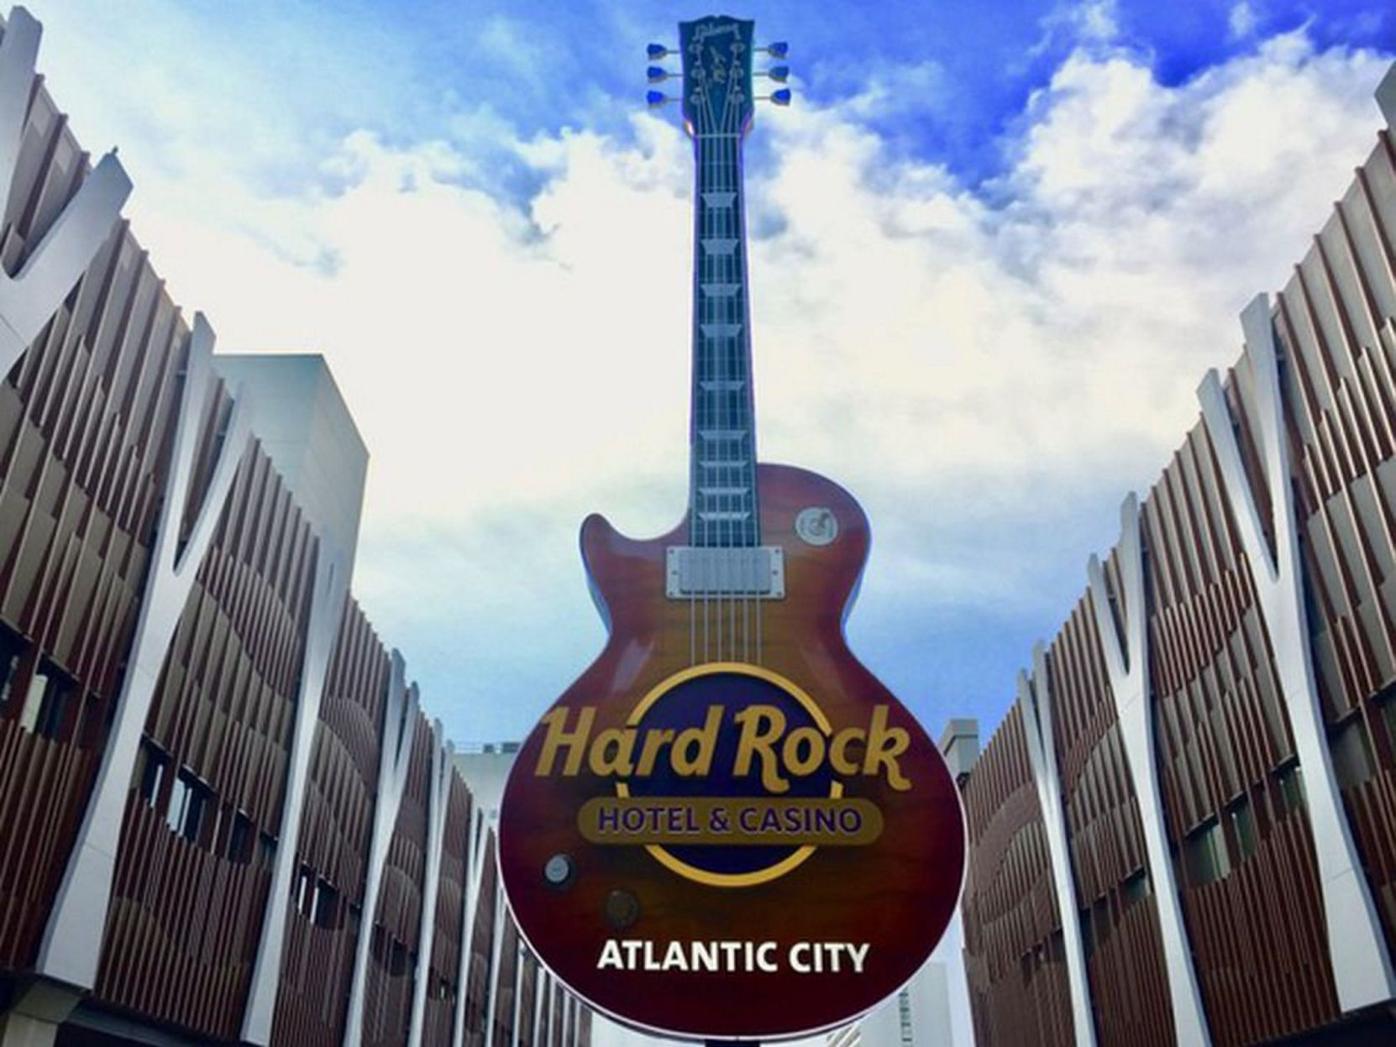 US-NEWS-HARD-ROCK-CASINO-WILL-HAVE-1-NJA